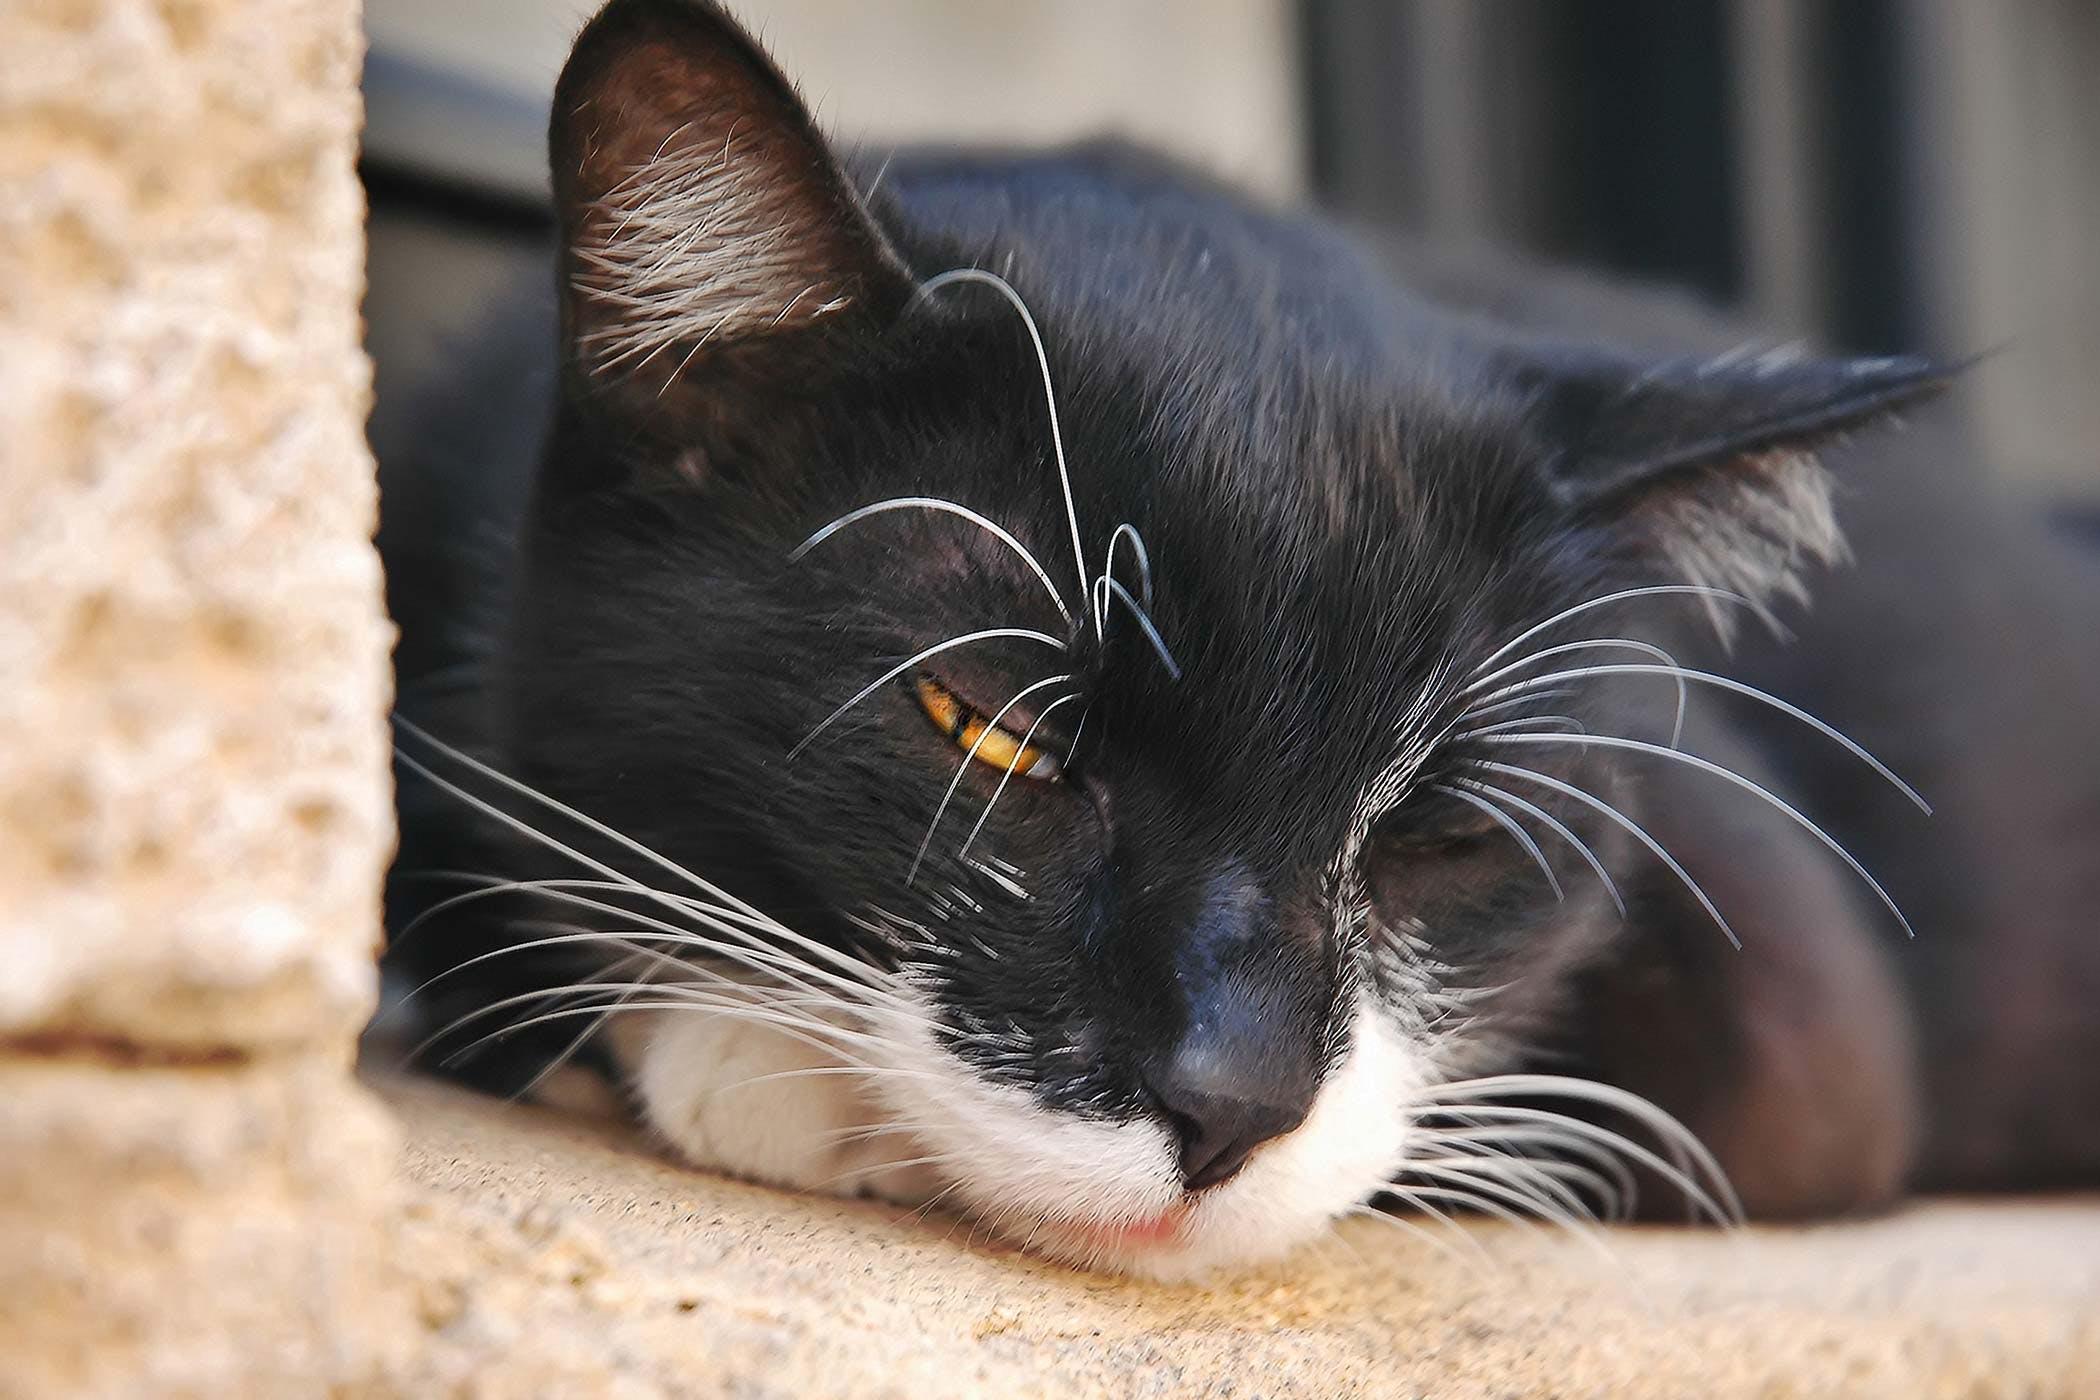 Sleek Cats Diagnosis Cat Throwing Up Clear Liquid Sneezing Cat Throwing Up Clear Liquid After Drinking Water Cats Fluid Abdomen Fluid Abdomen houzz 01 Cat Throwing Up Clear Liquid